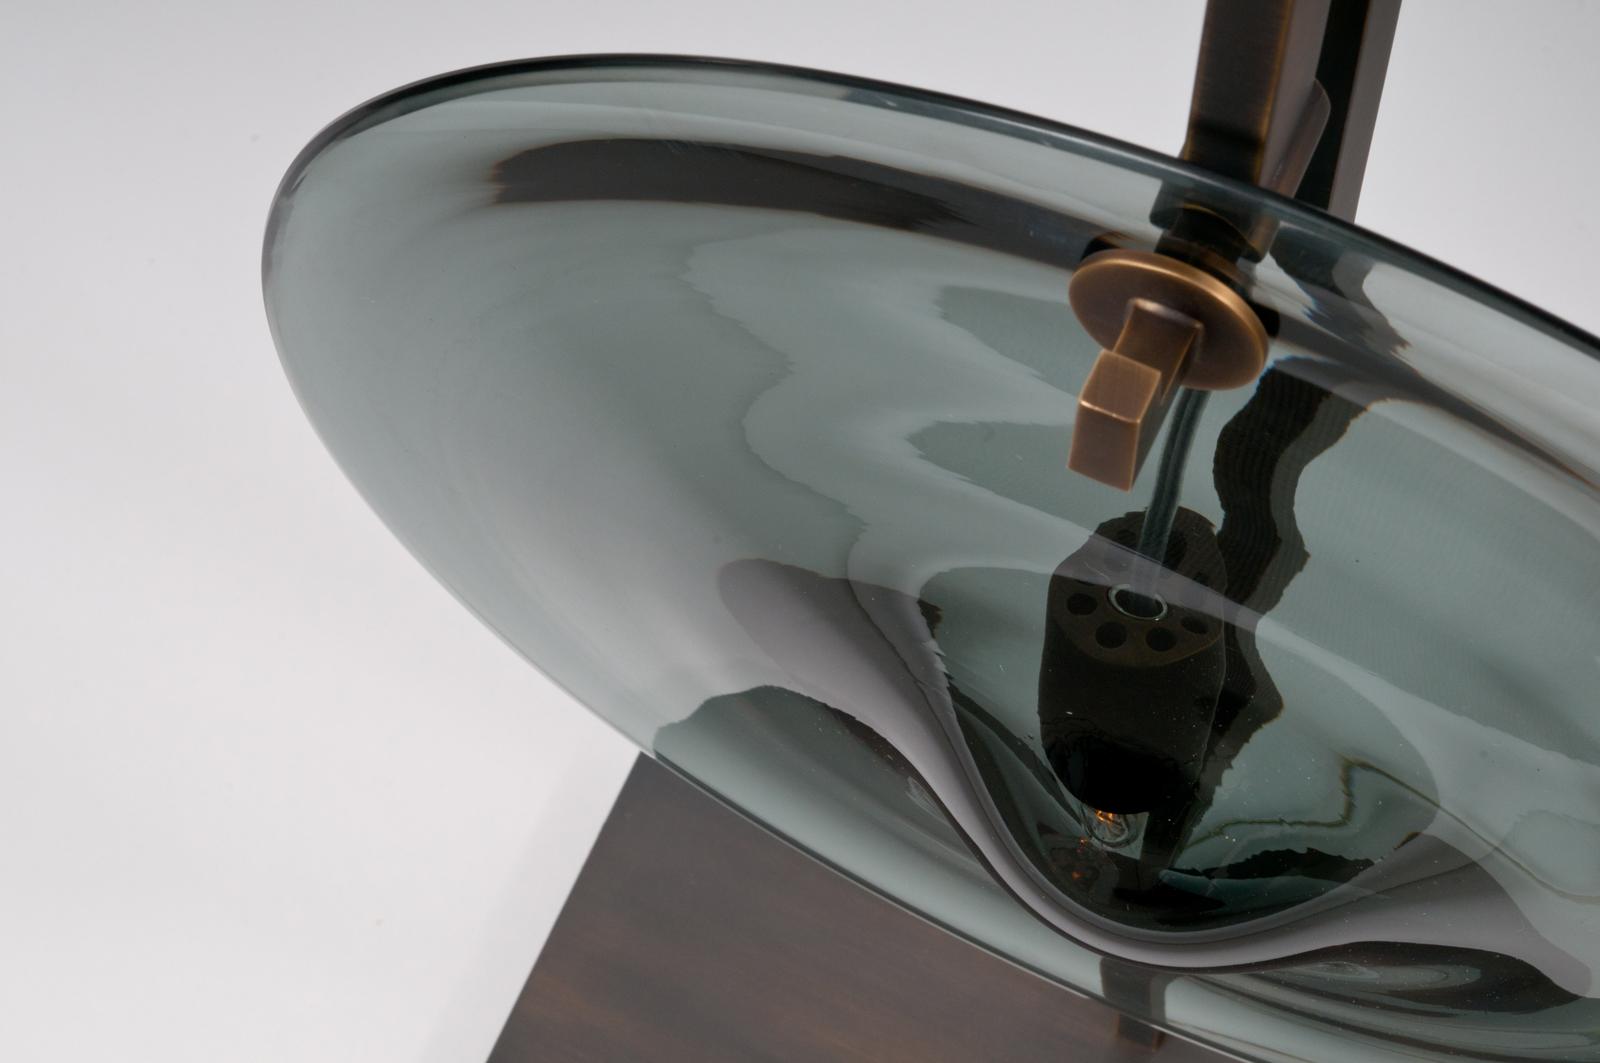 orbe-table-bronze-grey-gris-patrick-naggar-veronese-2.jpg